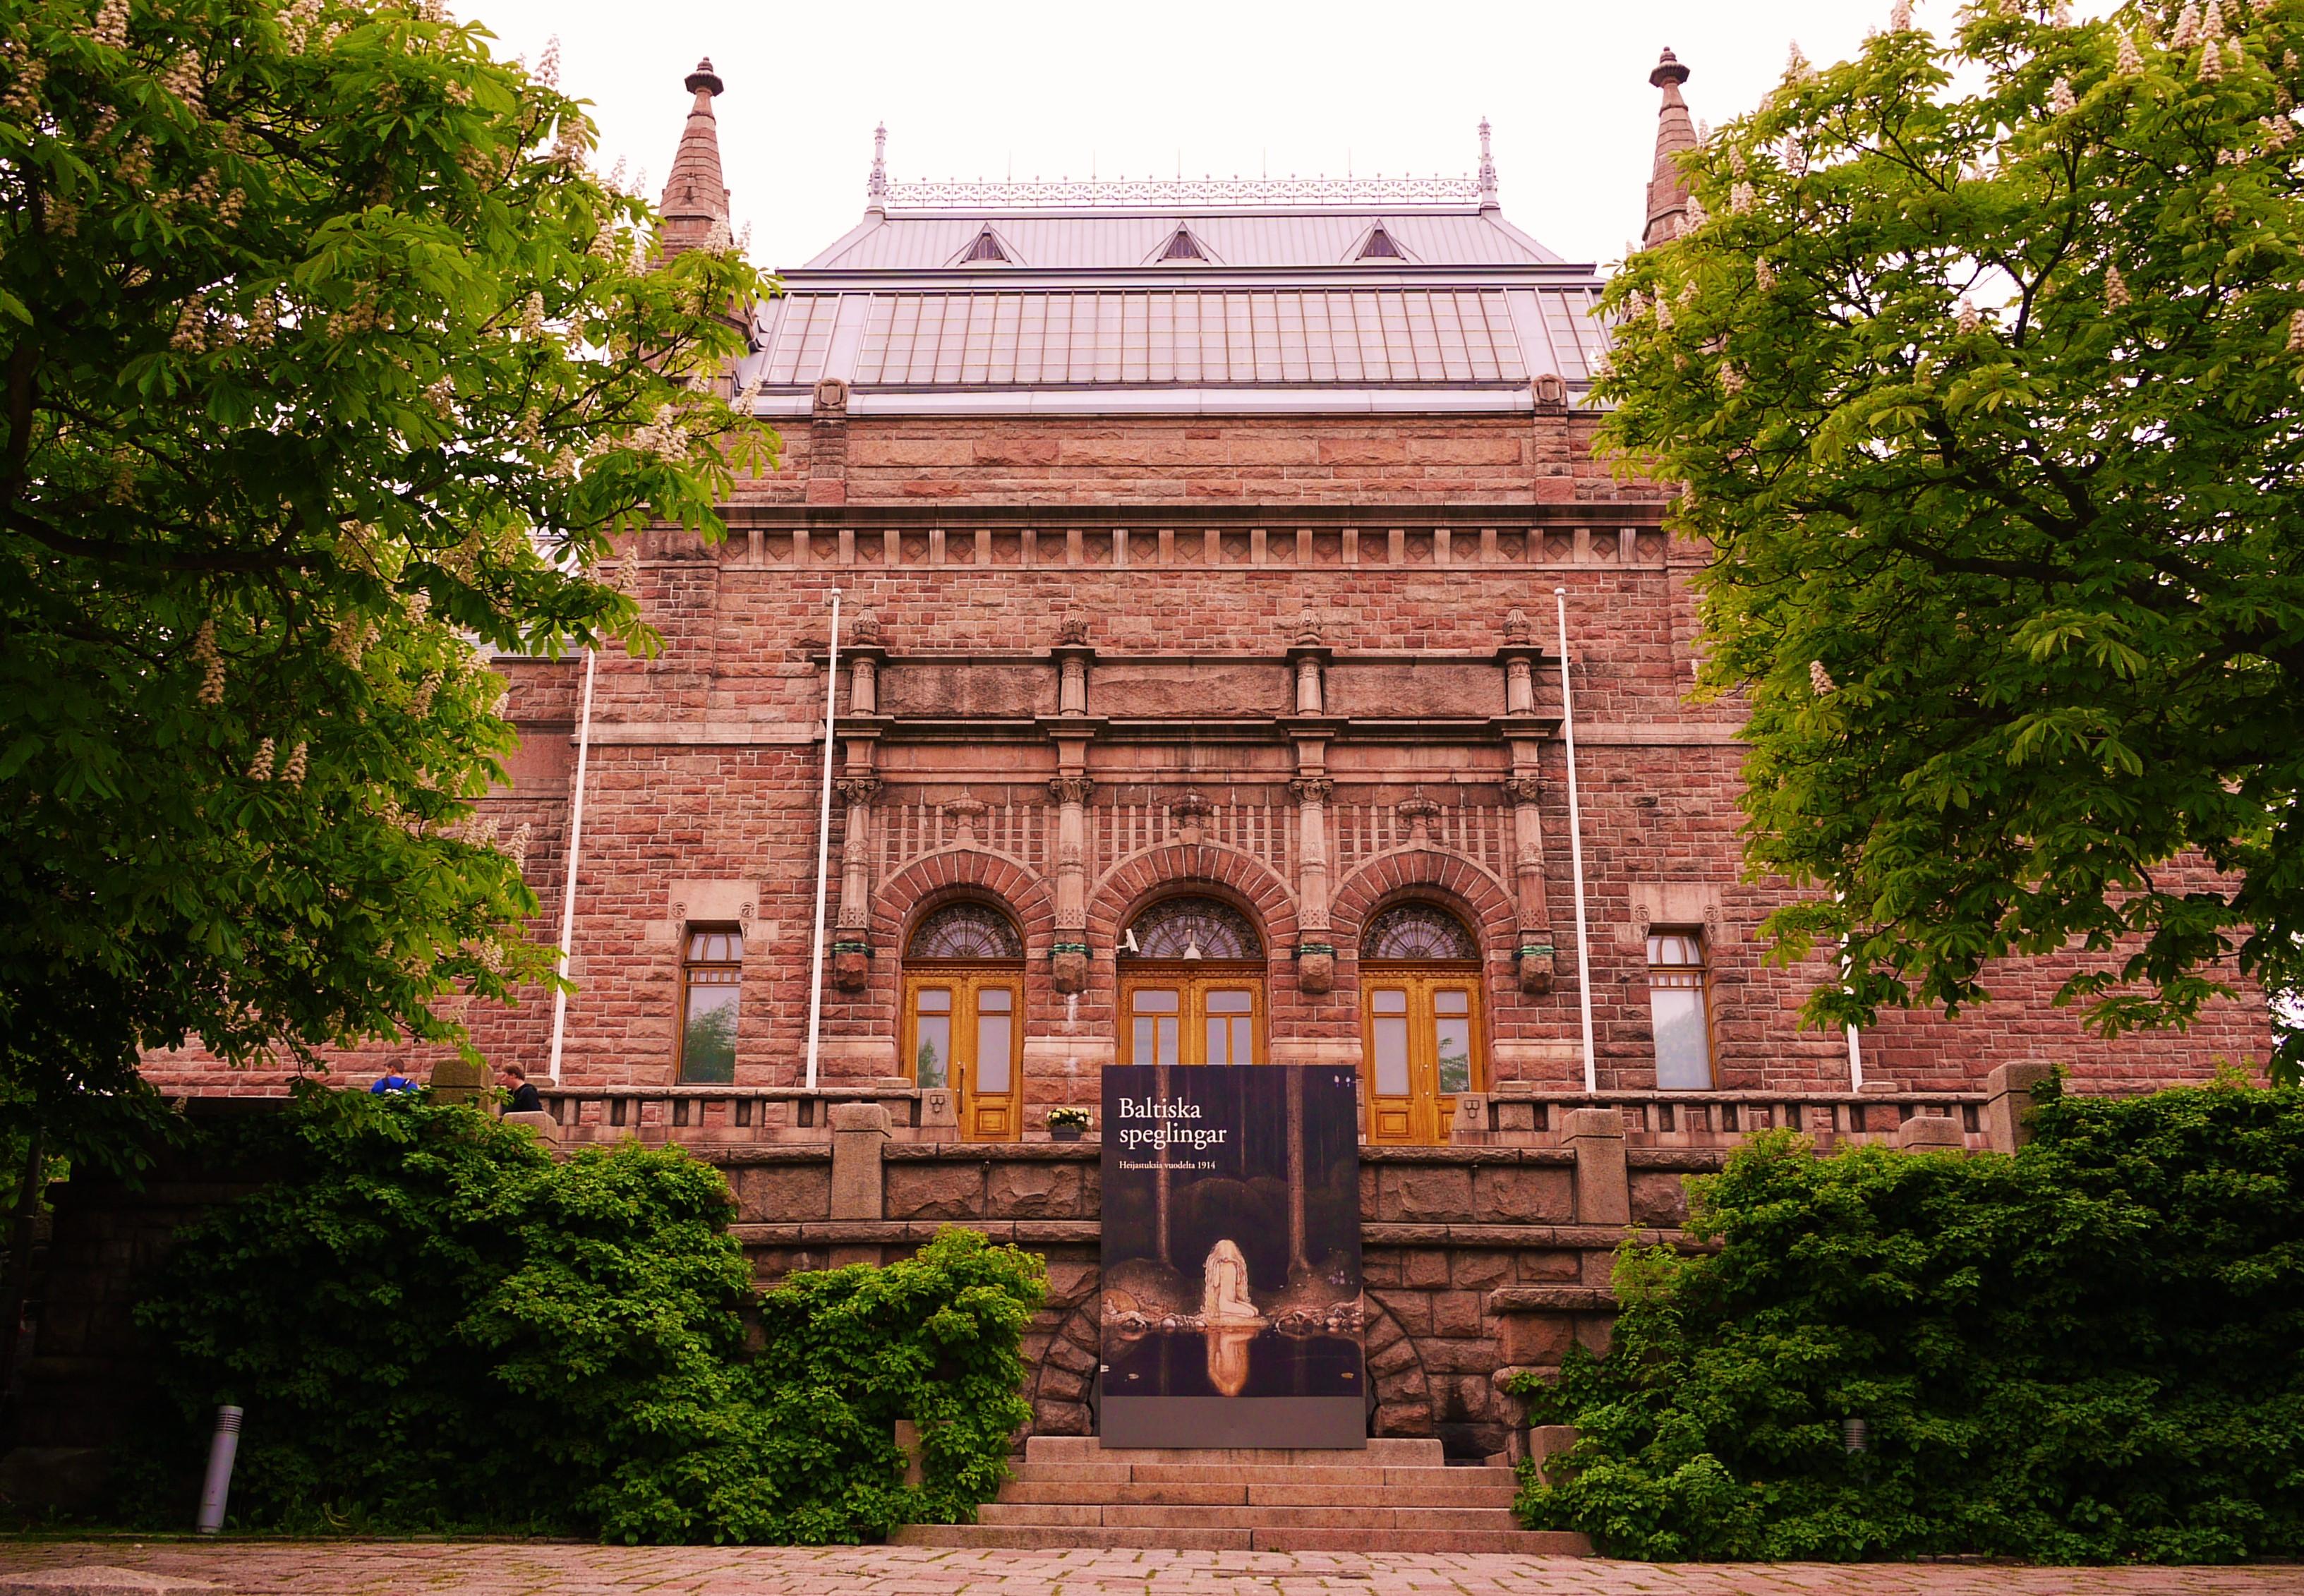 Turku Art Museum